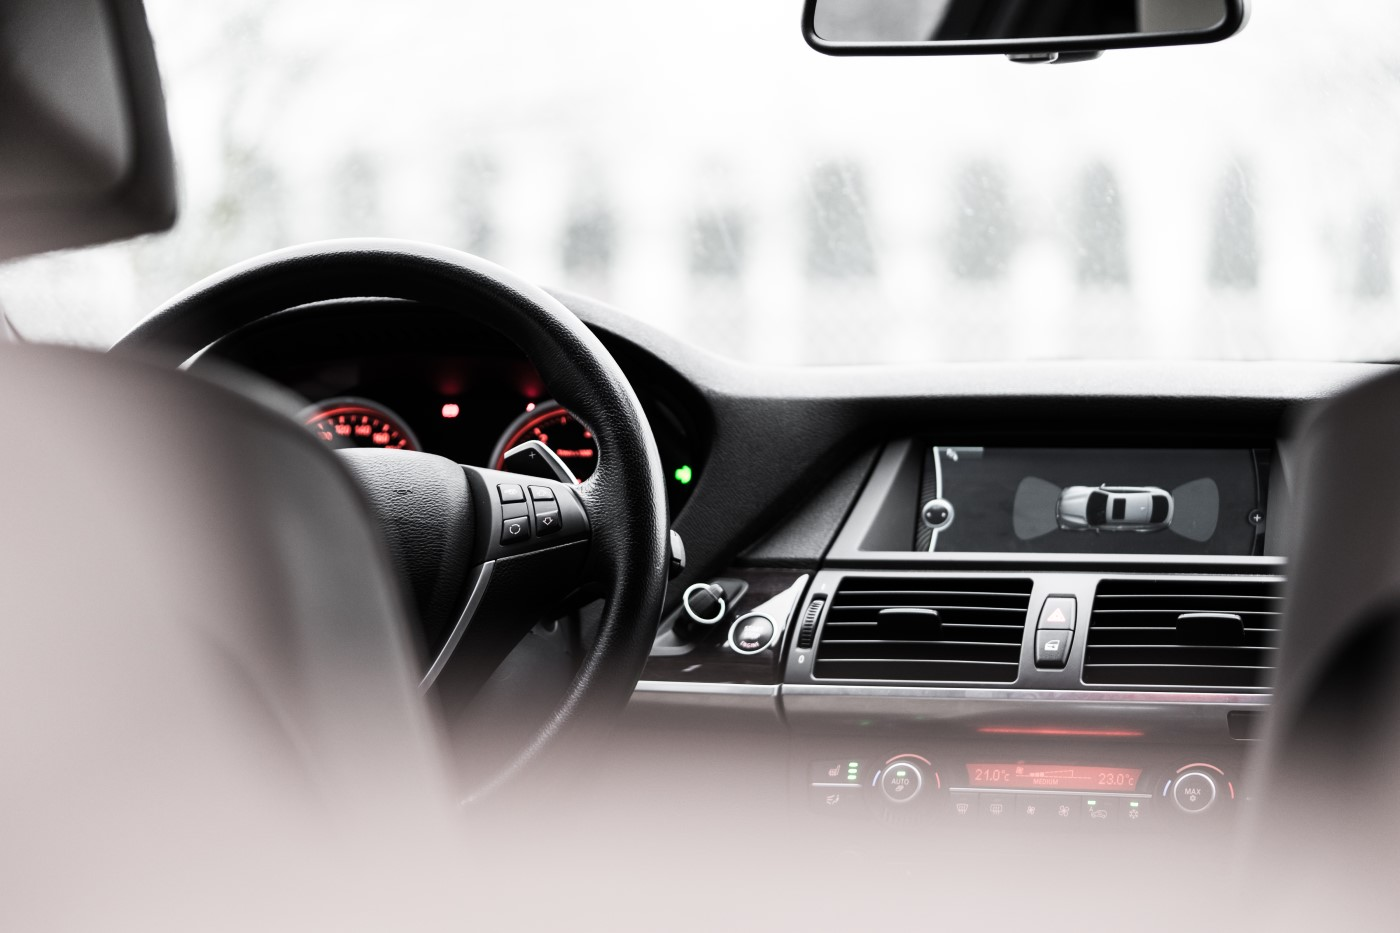 car interior with a wheel